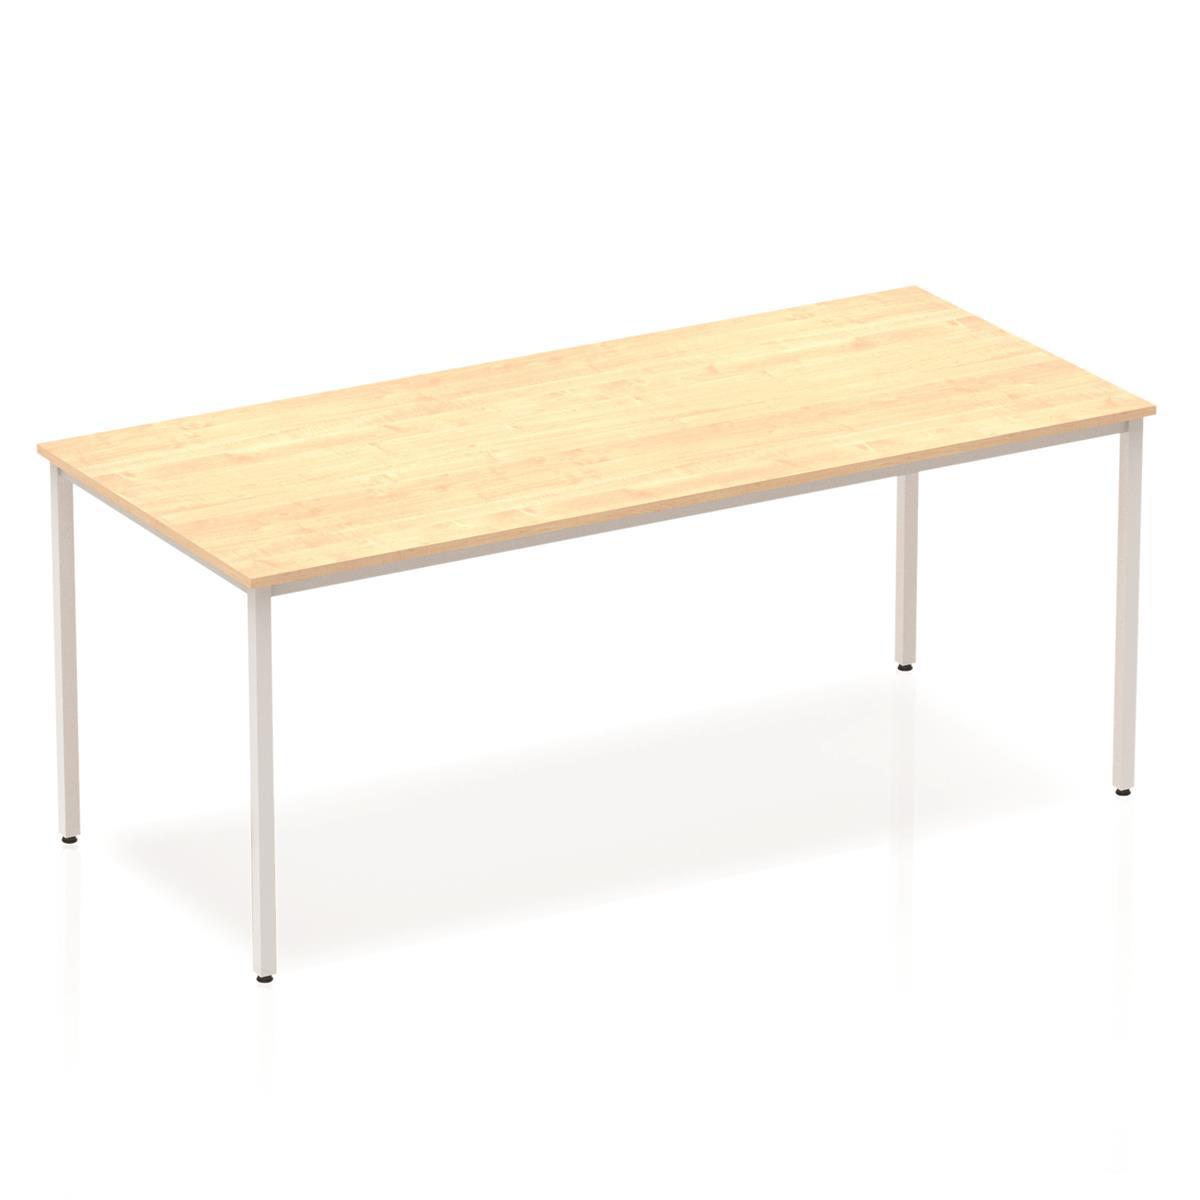 Trexus Rectangular Box Frame Silver Leg Table 1800x800mm Maple Ref BF00157